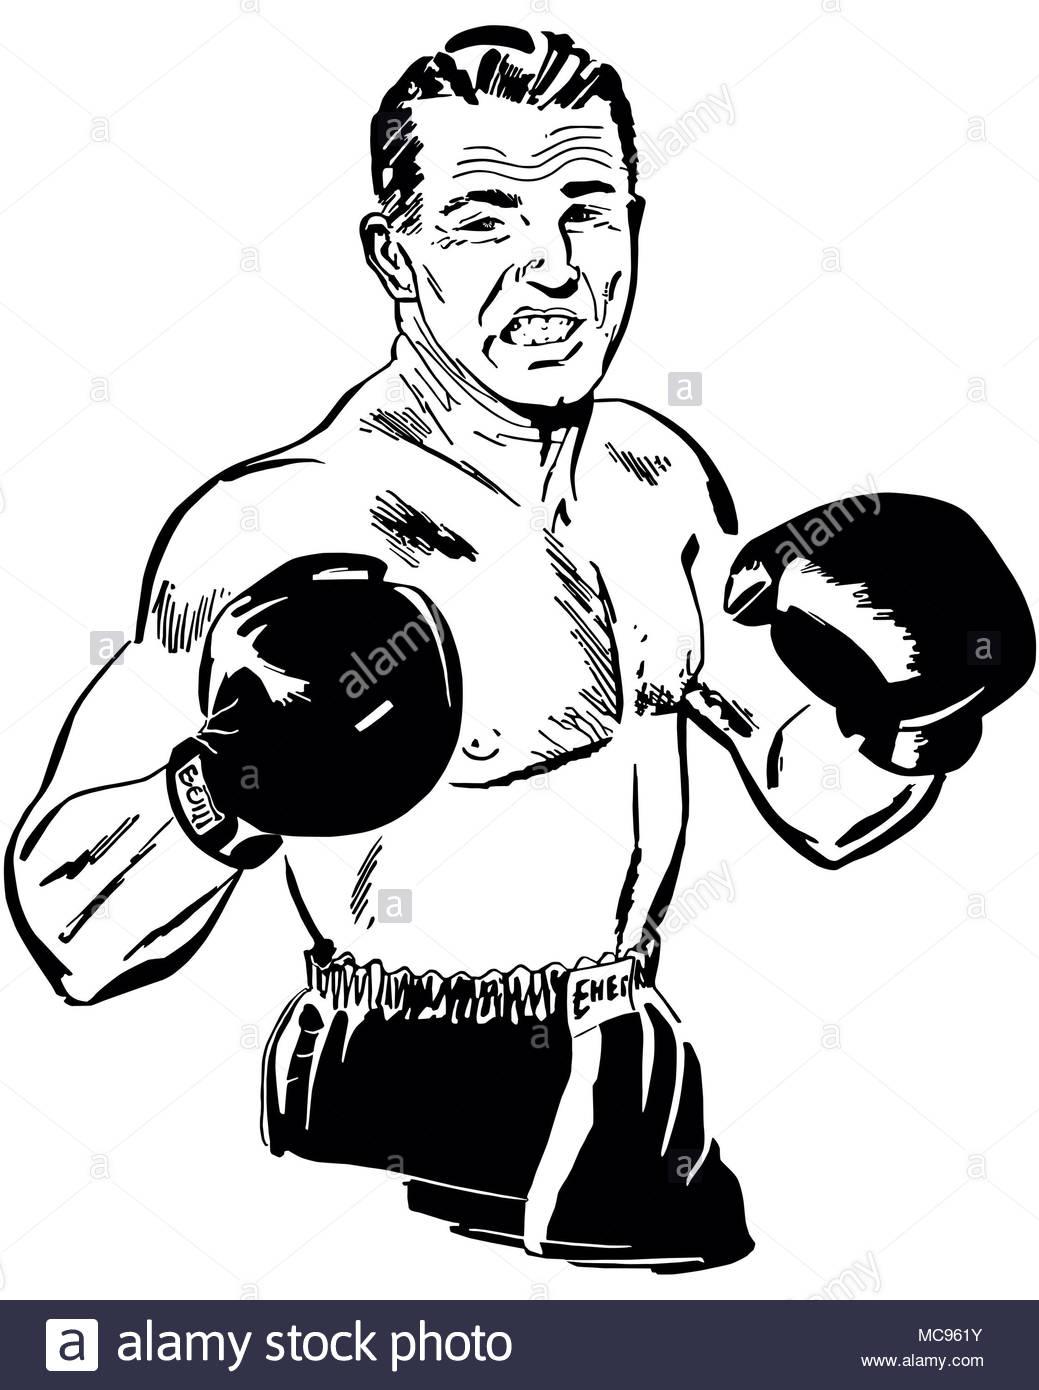 Professional Boxer.